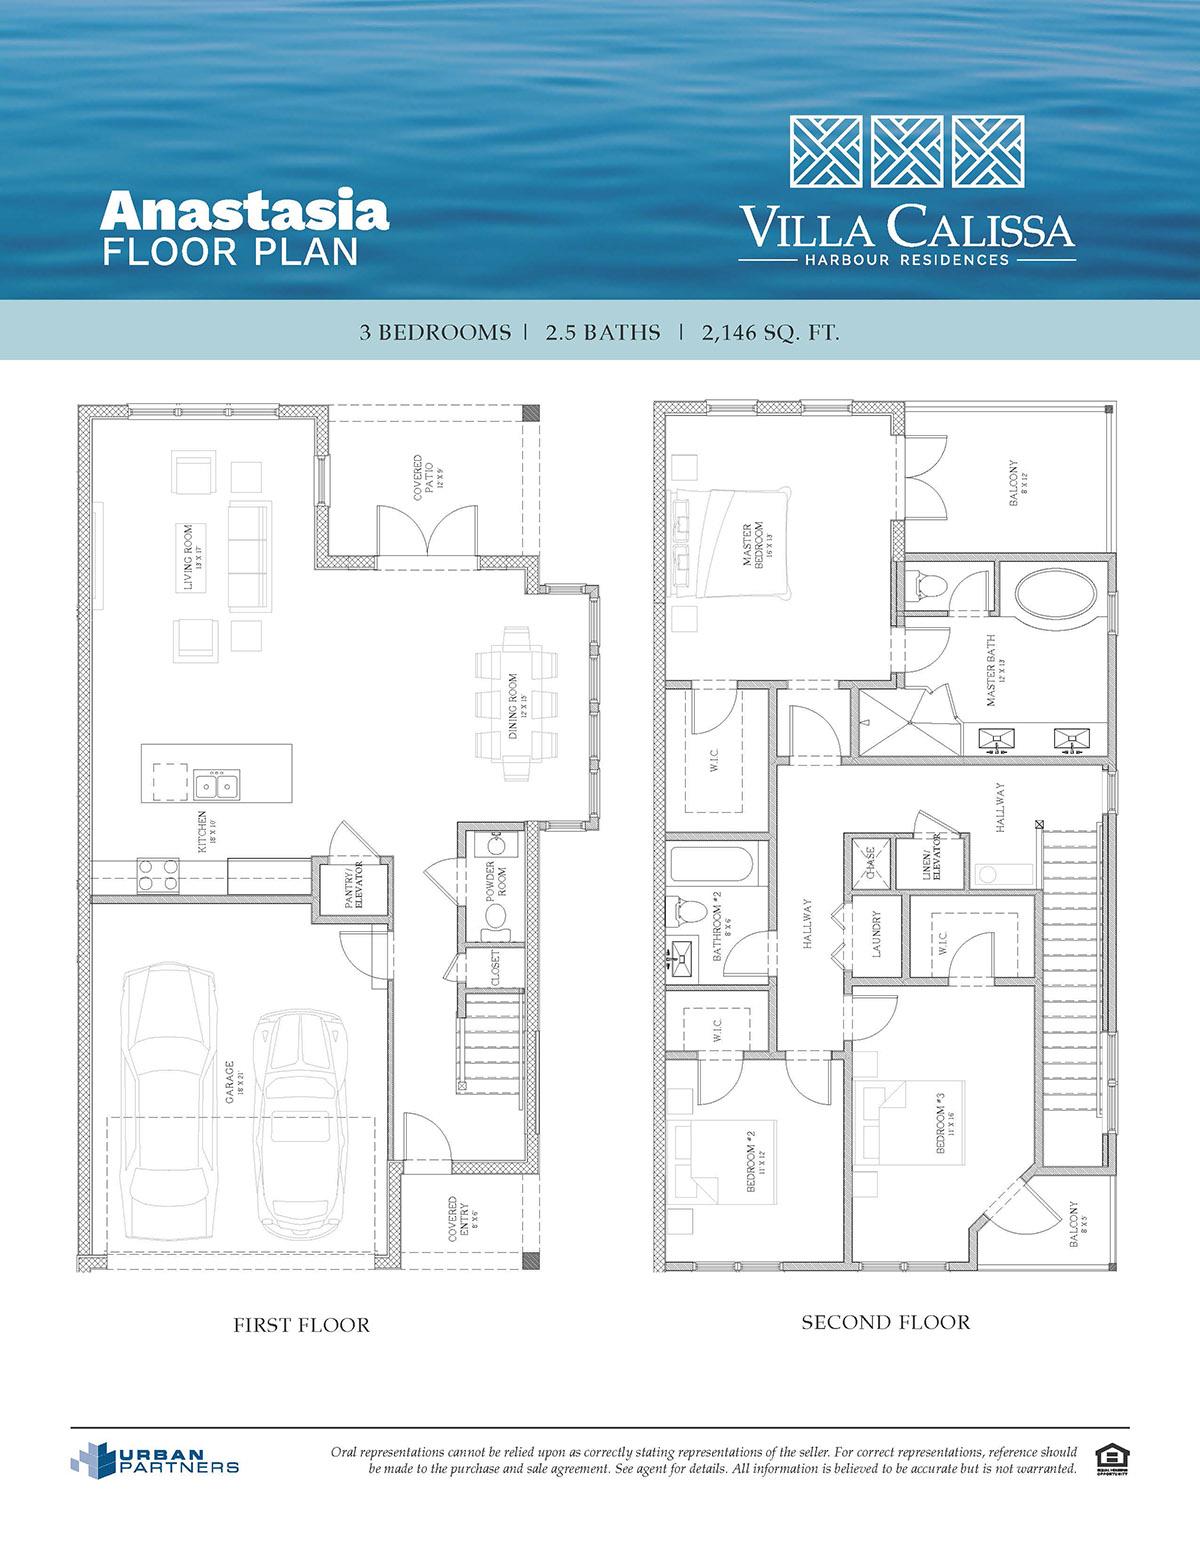 vc-anastasia-jpg